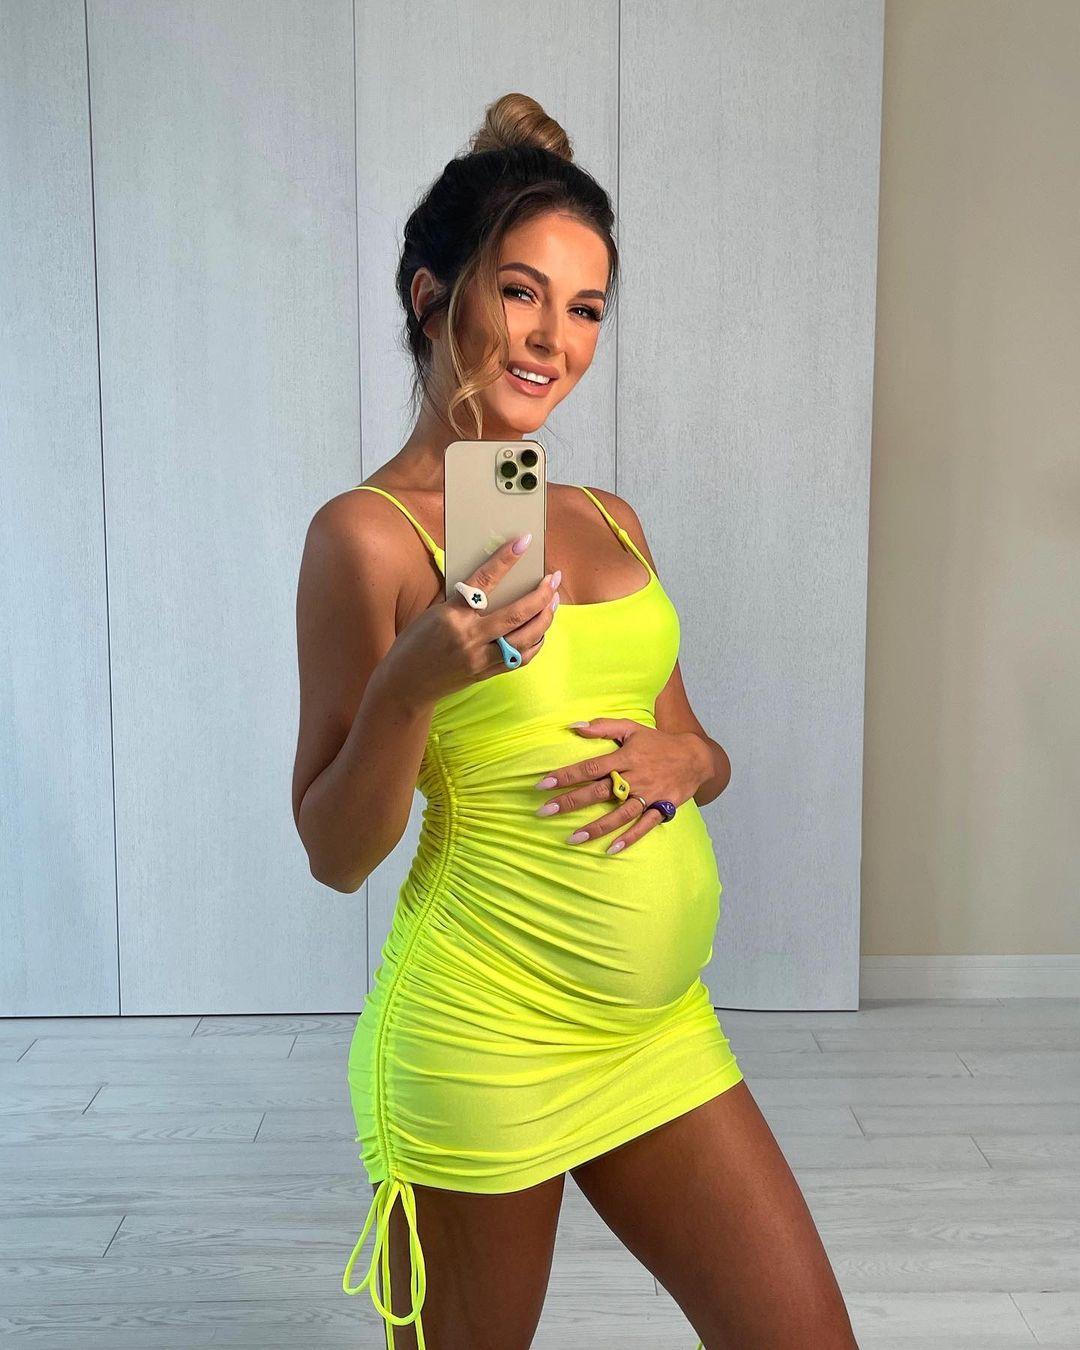 нюша беременна